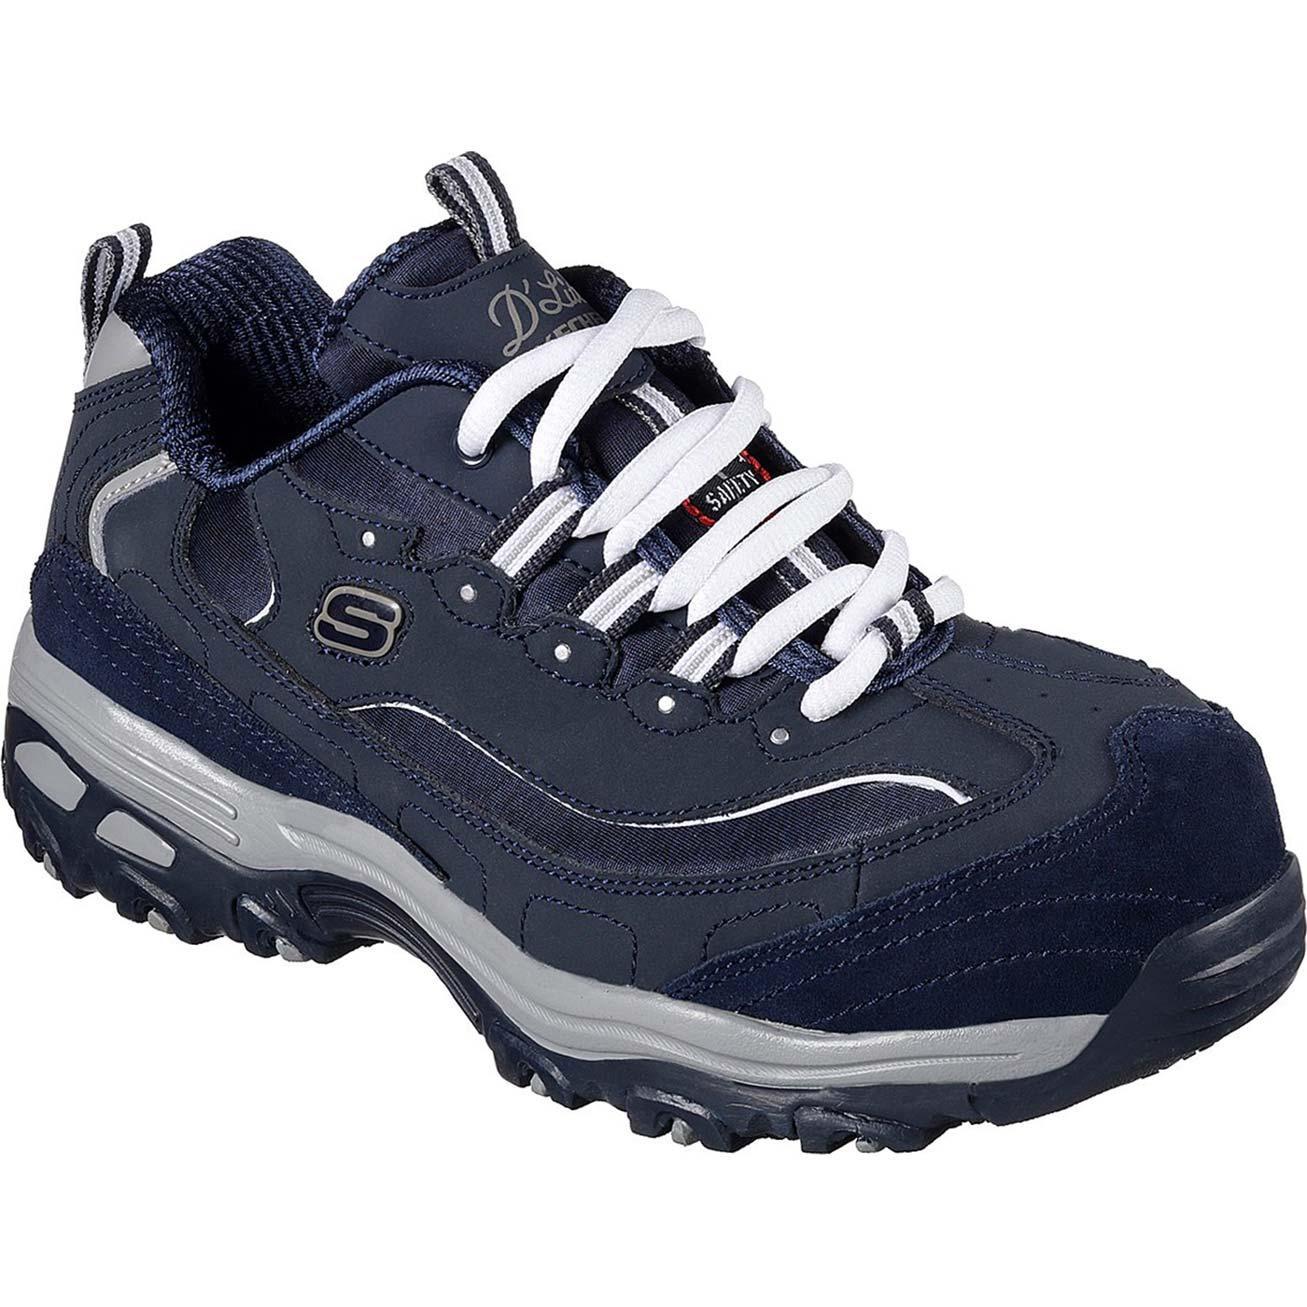 8bc2aa1b6e SKECHERS Work D'Lites Pooler Women's Alloy Toe Slip-Resistant Work Athletic  Shoe,